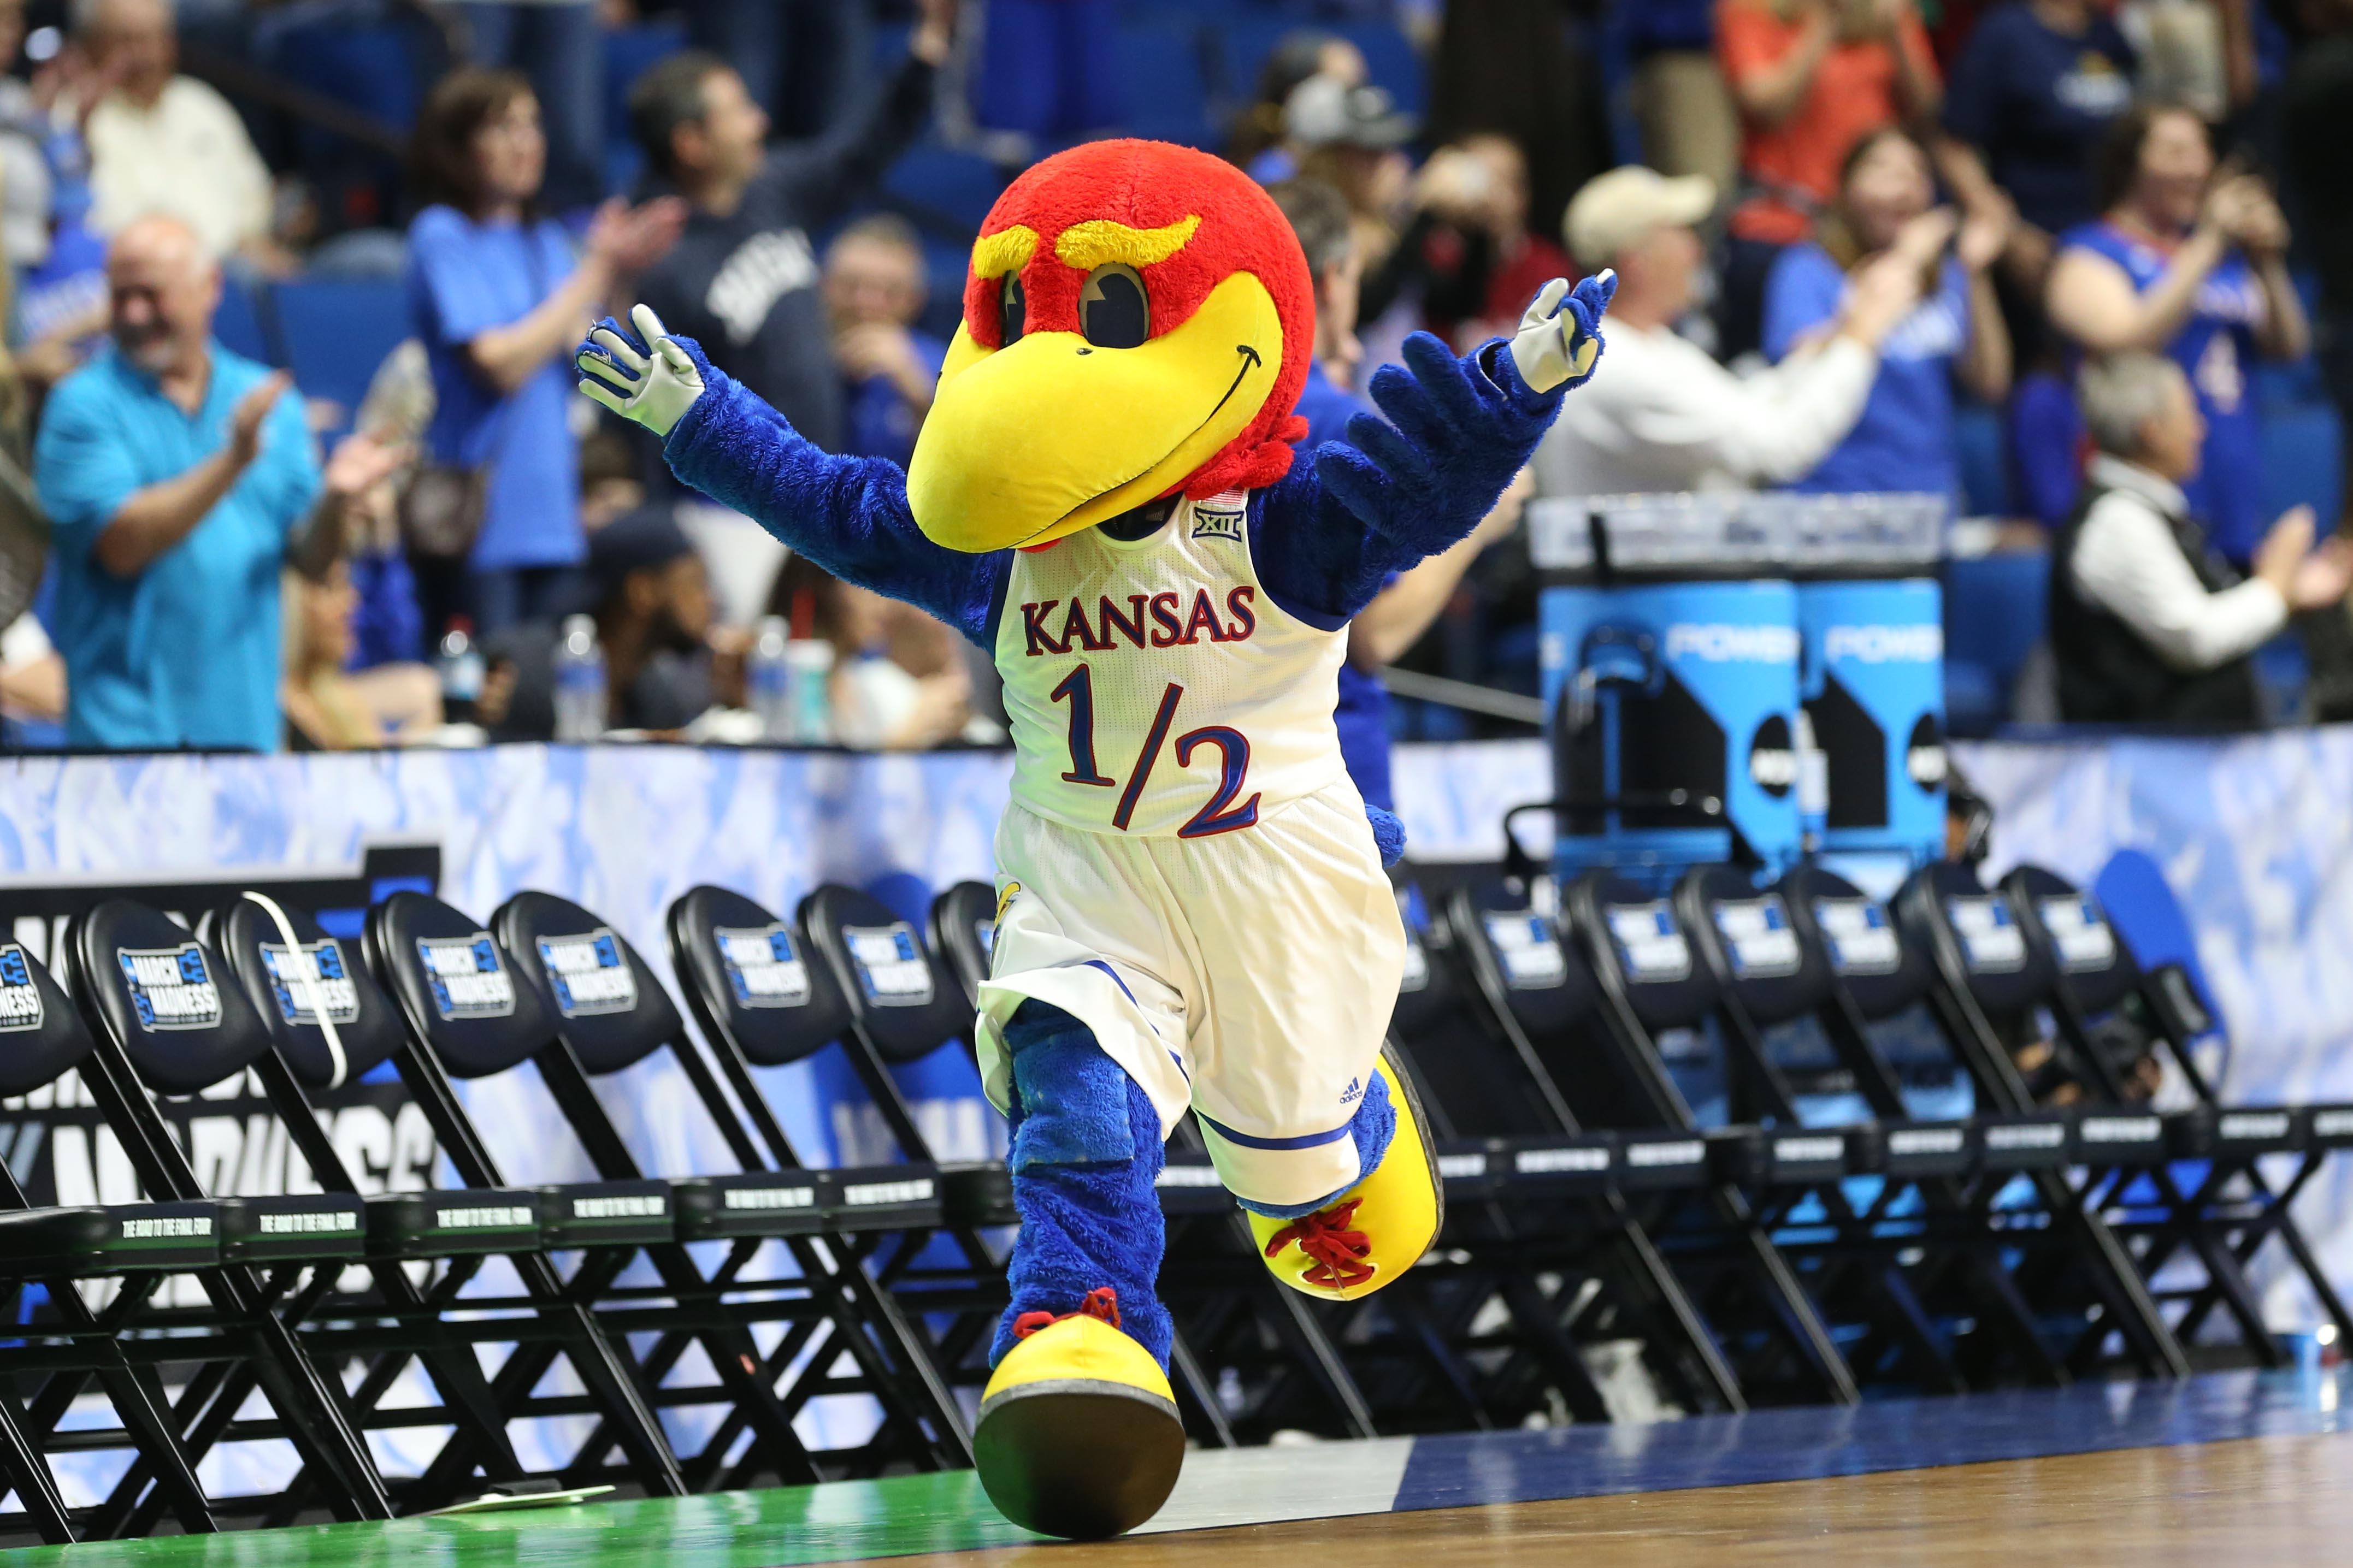 9958037-ncaa-basketball-ncaa-tournament-second-round-kansas-vs-michigan-state